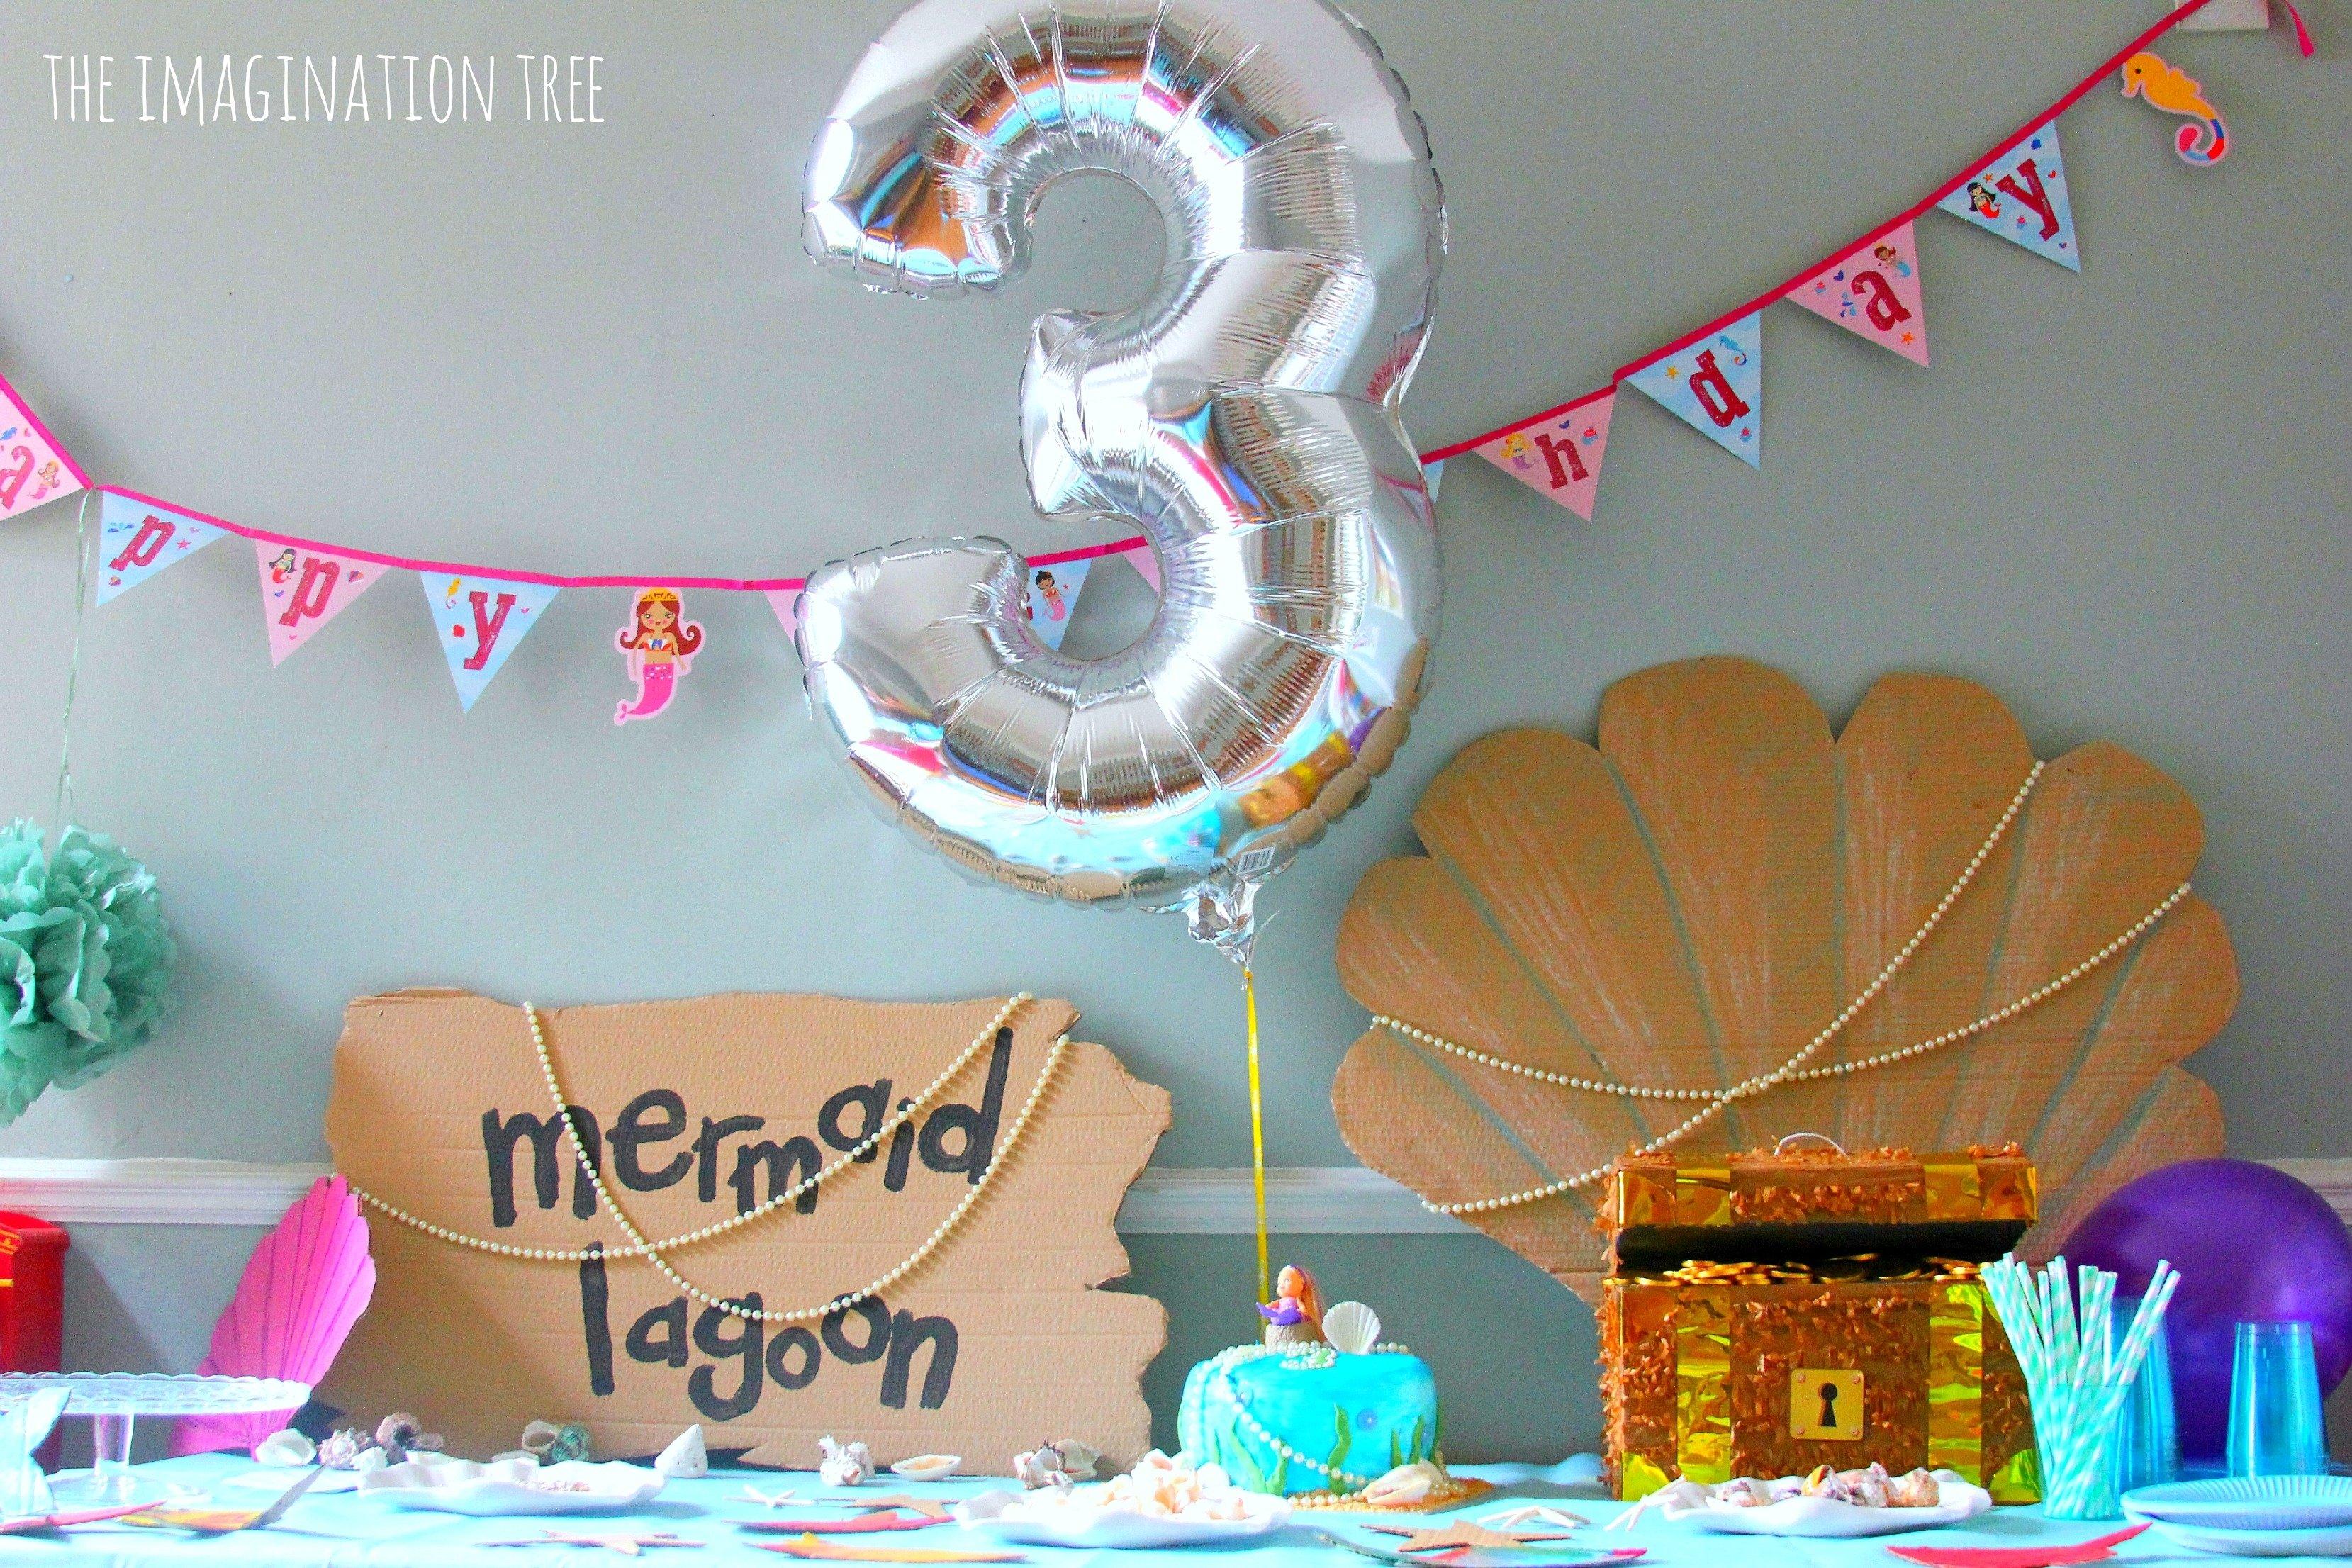 10 Cute 11 Year Old Birthday Ideas mermaid birthday party ideas the imagination tree 6